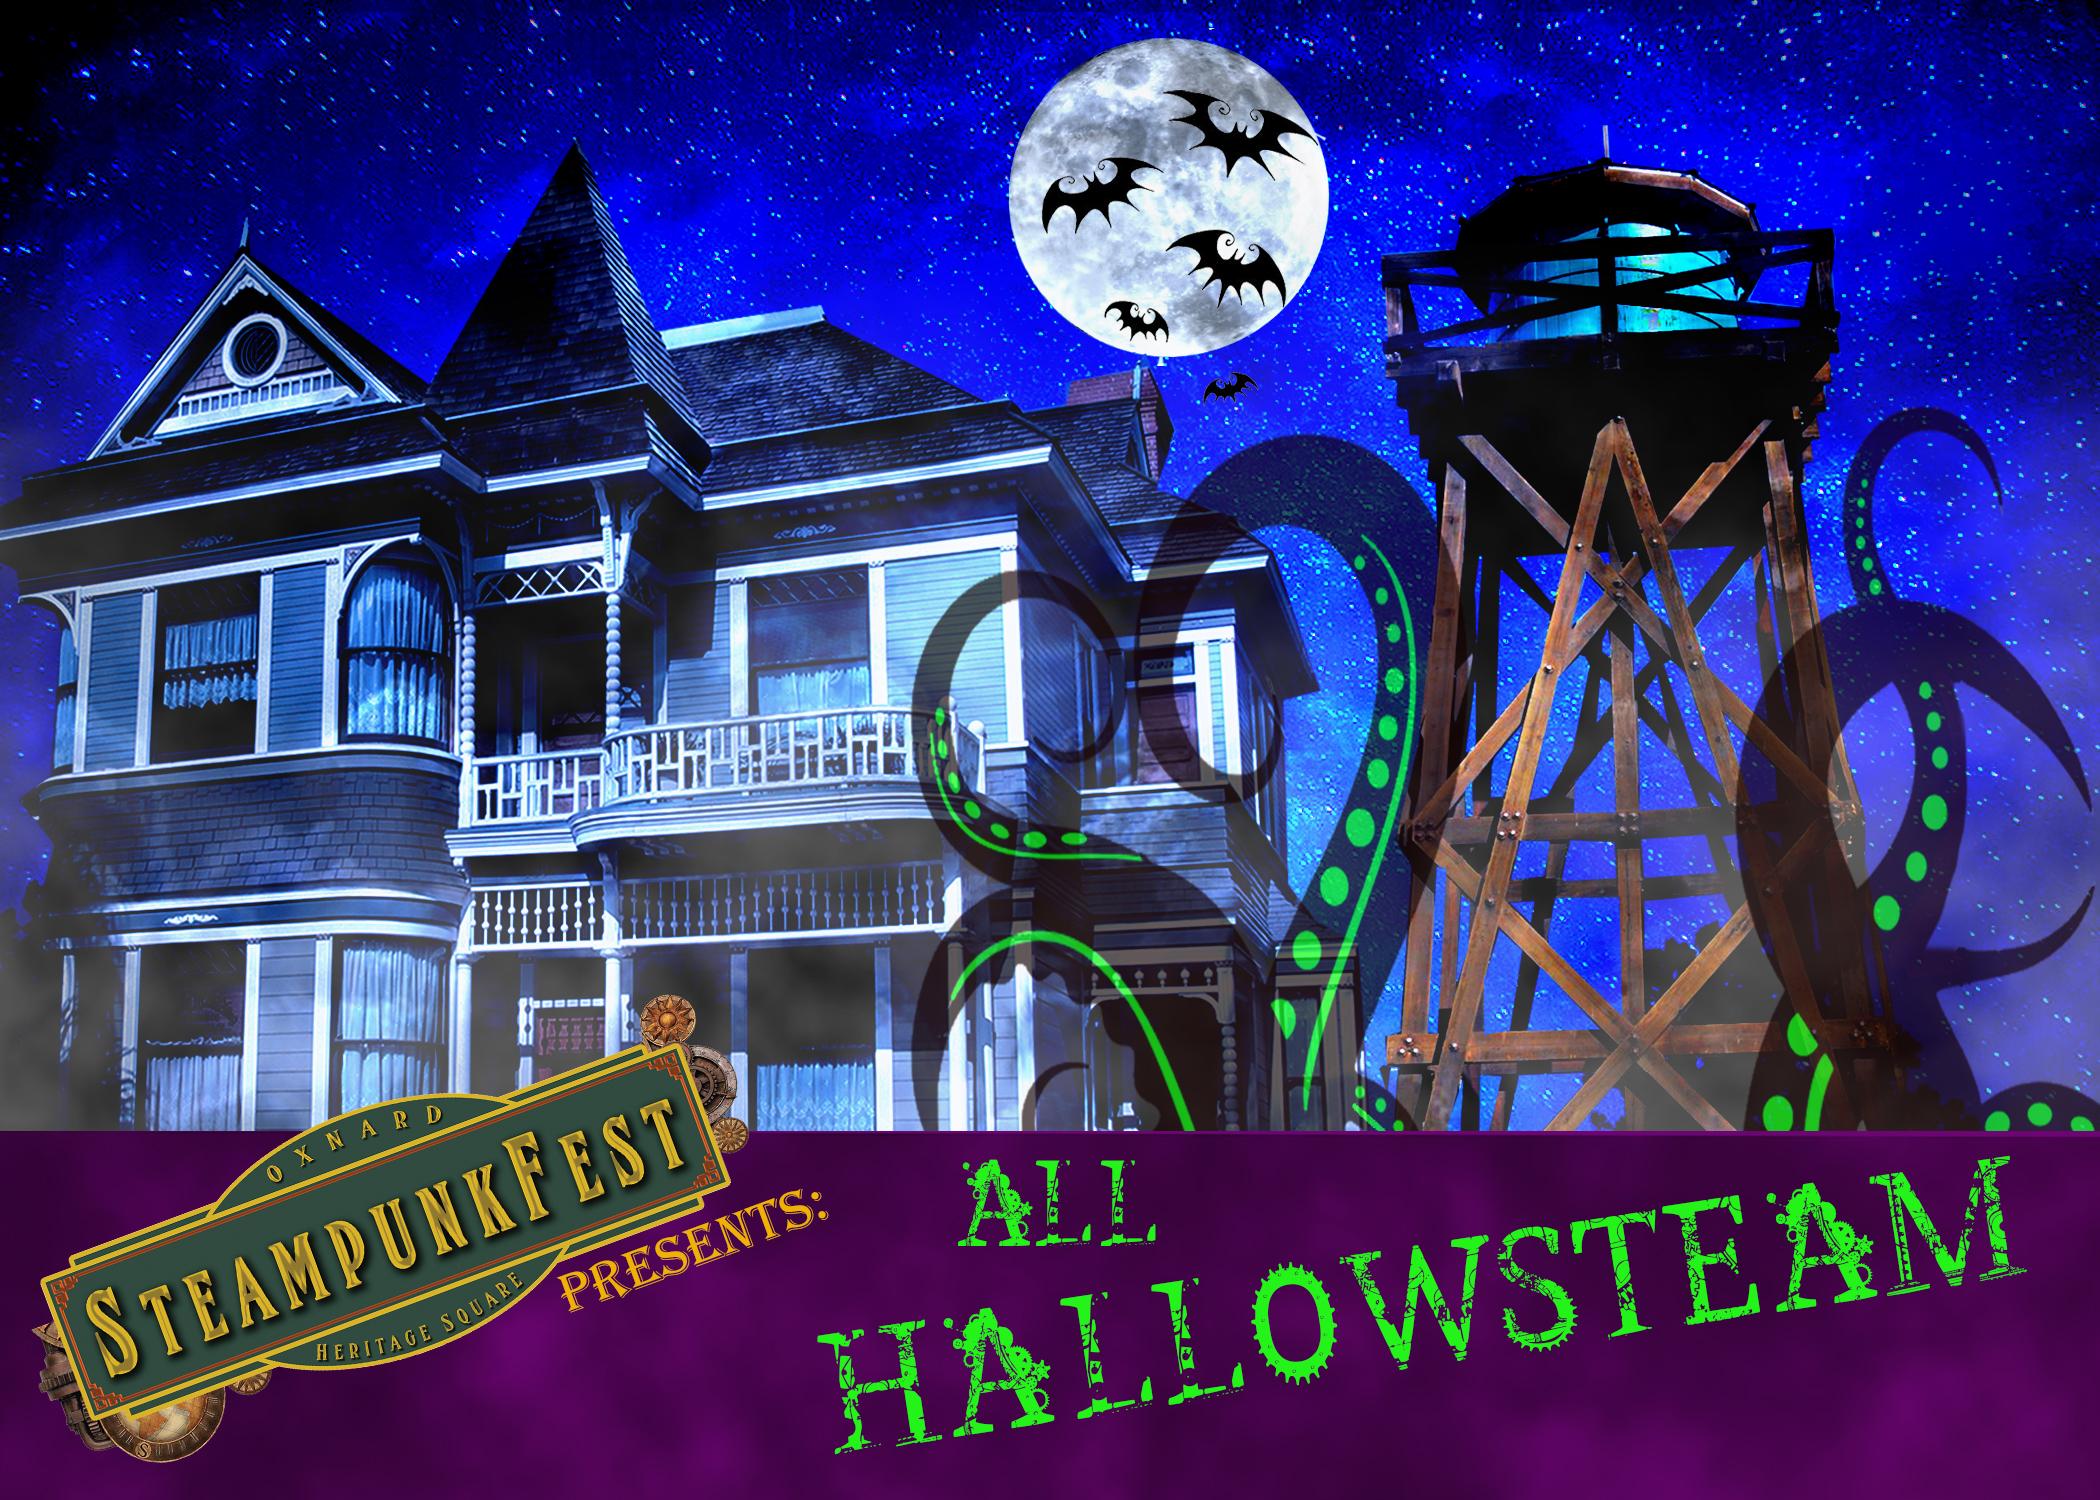 Oxnard Steampunk Fest: All Hallowsteam